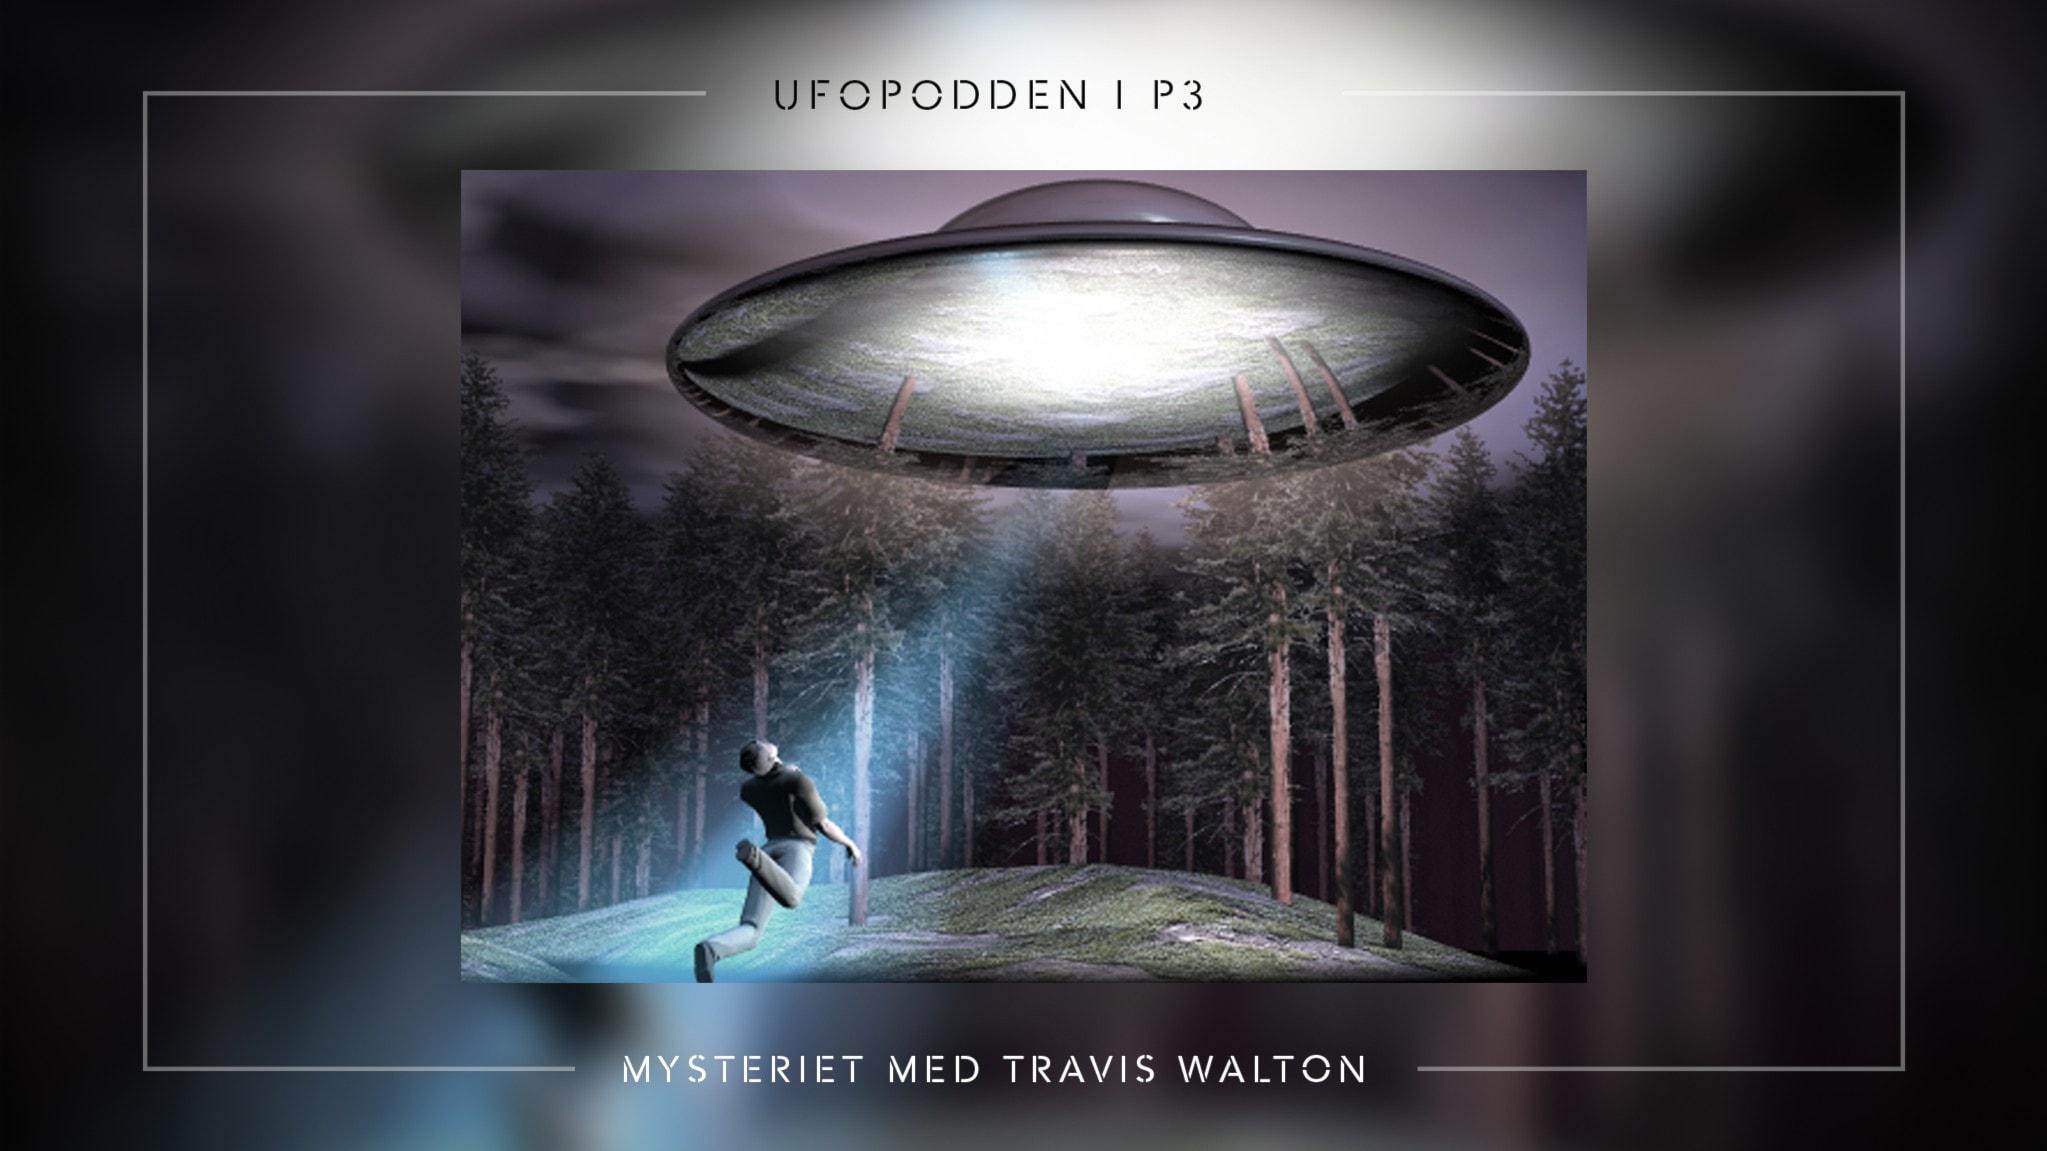 Mysteriet med Travis Walton